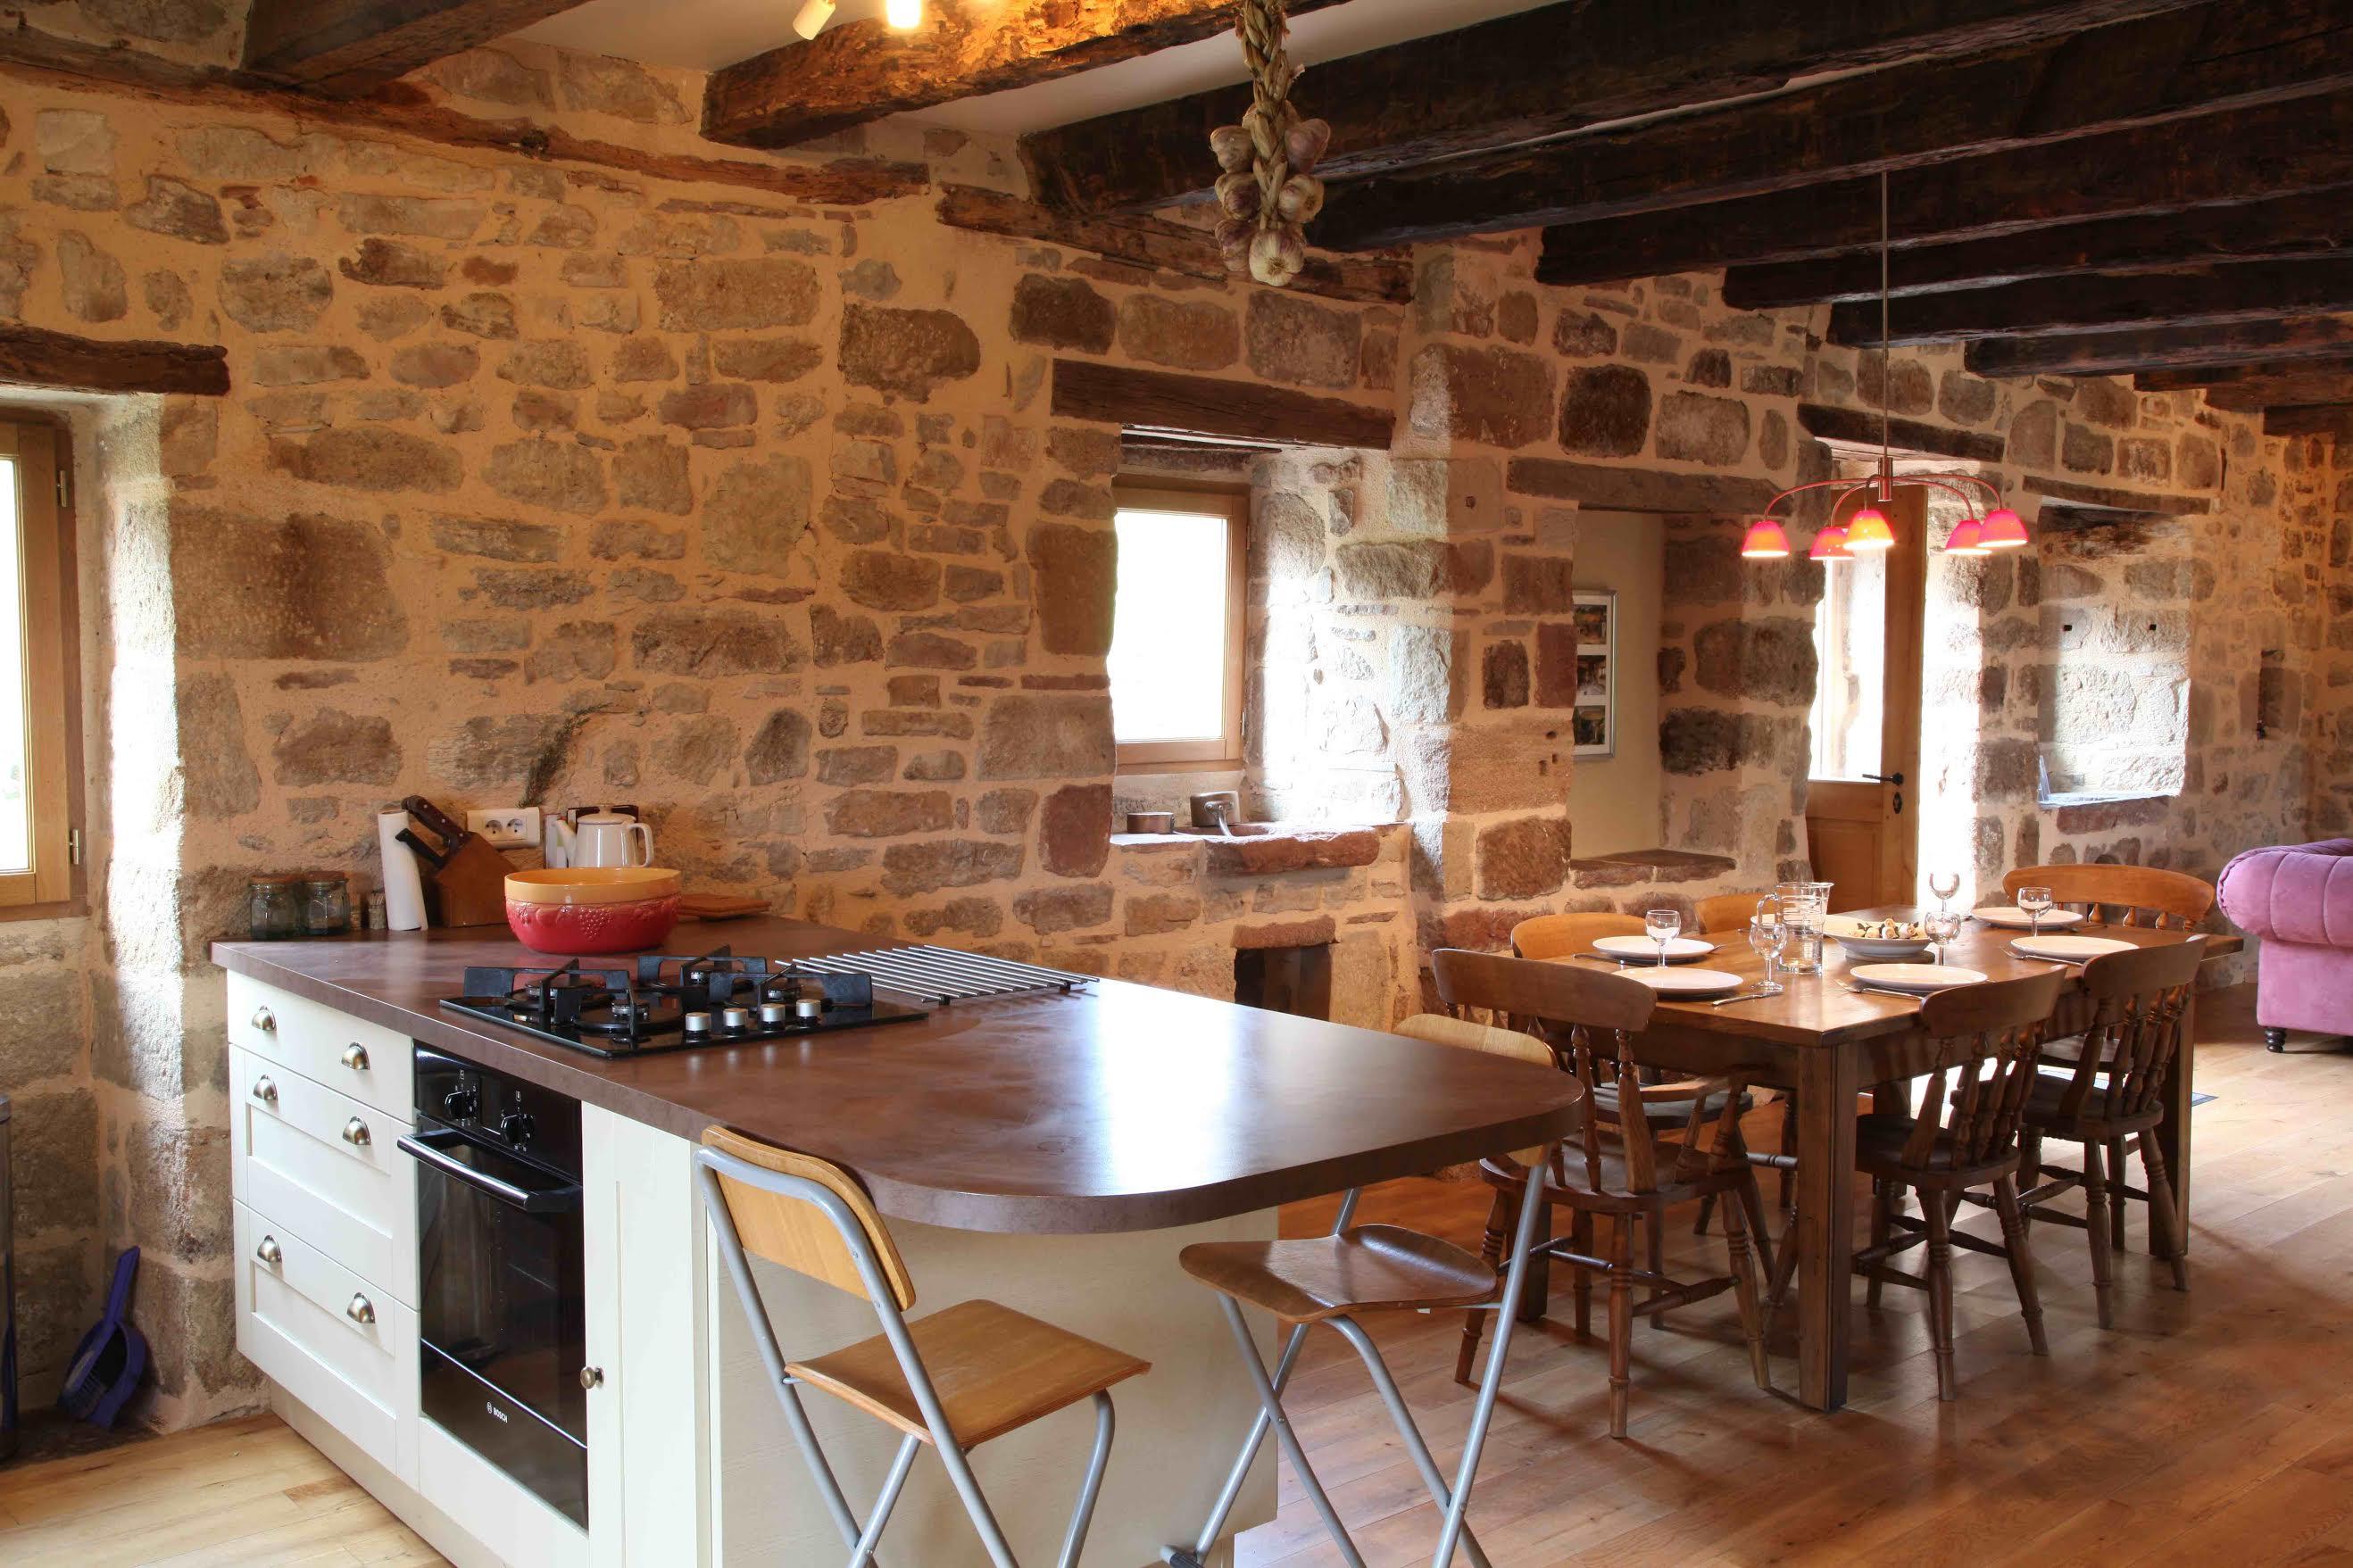 Fleuret Holidays Lascombes Gite, Dordogne kitchen